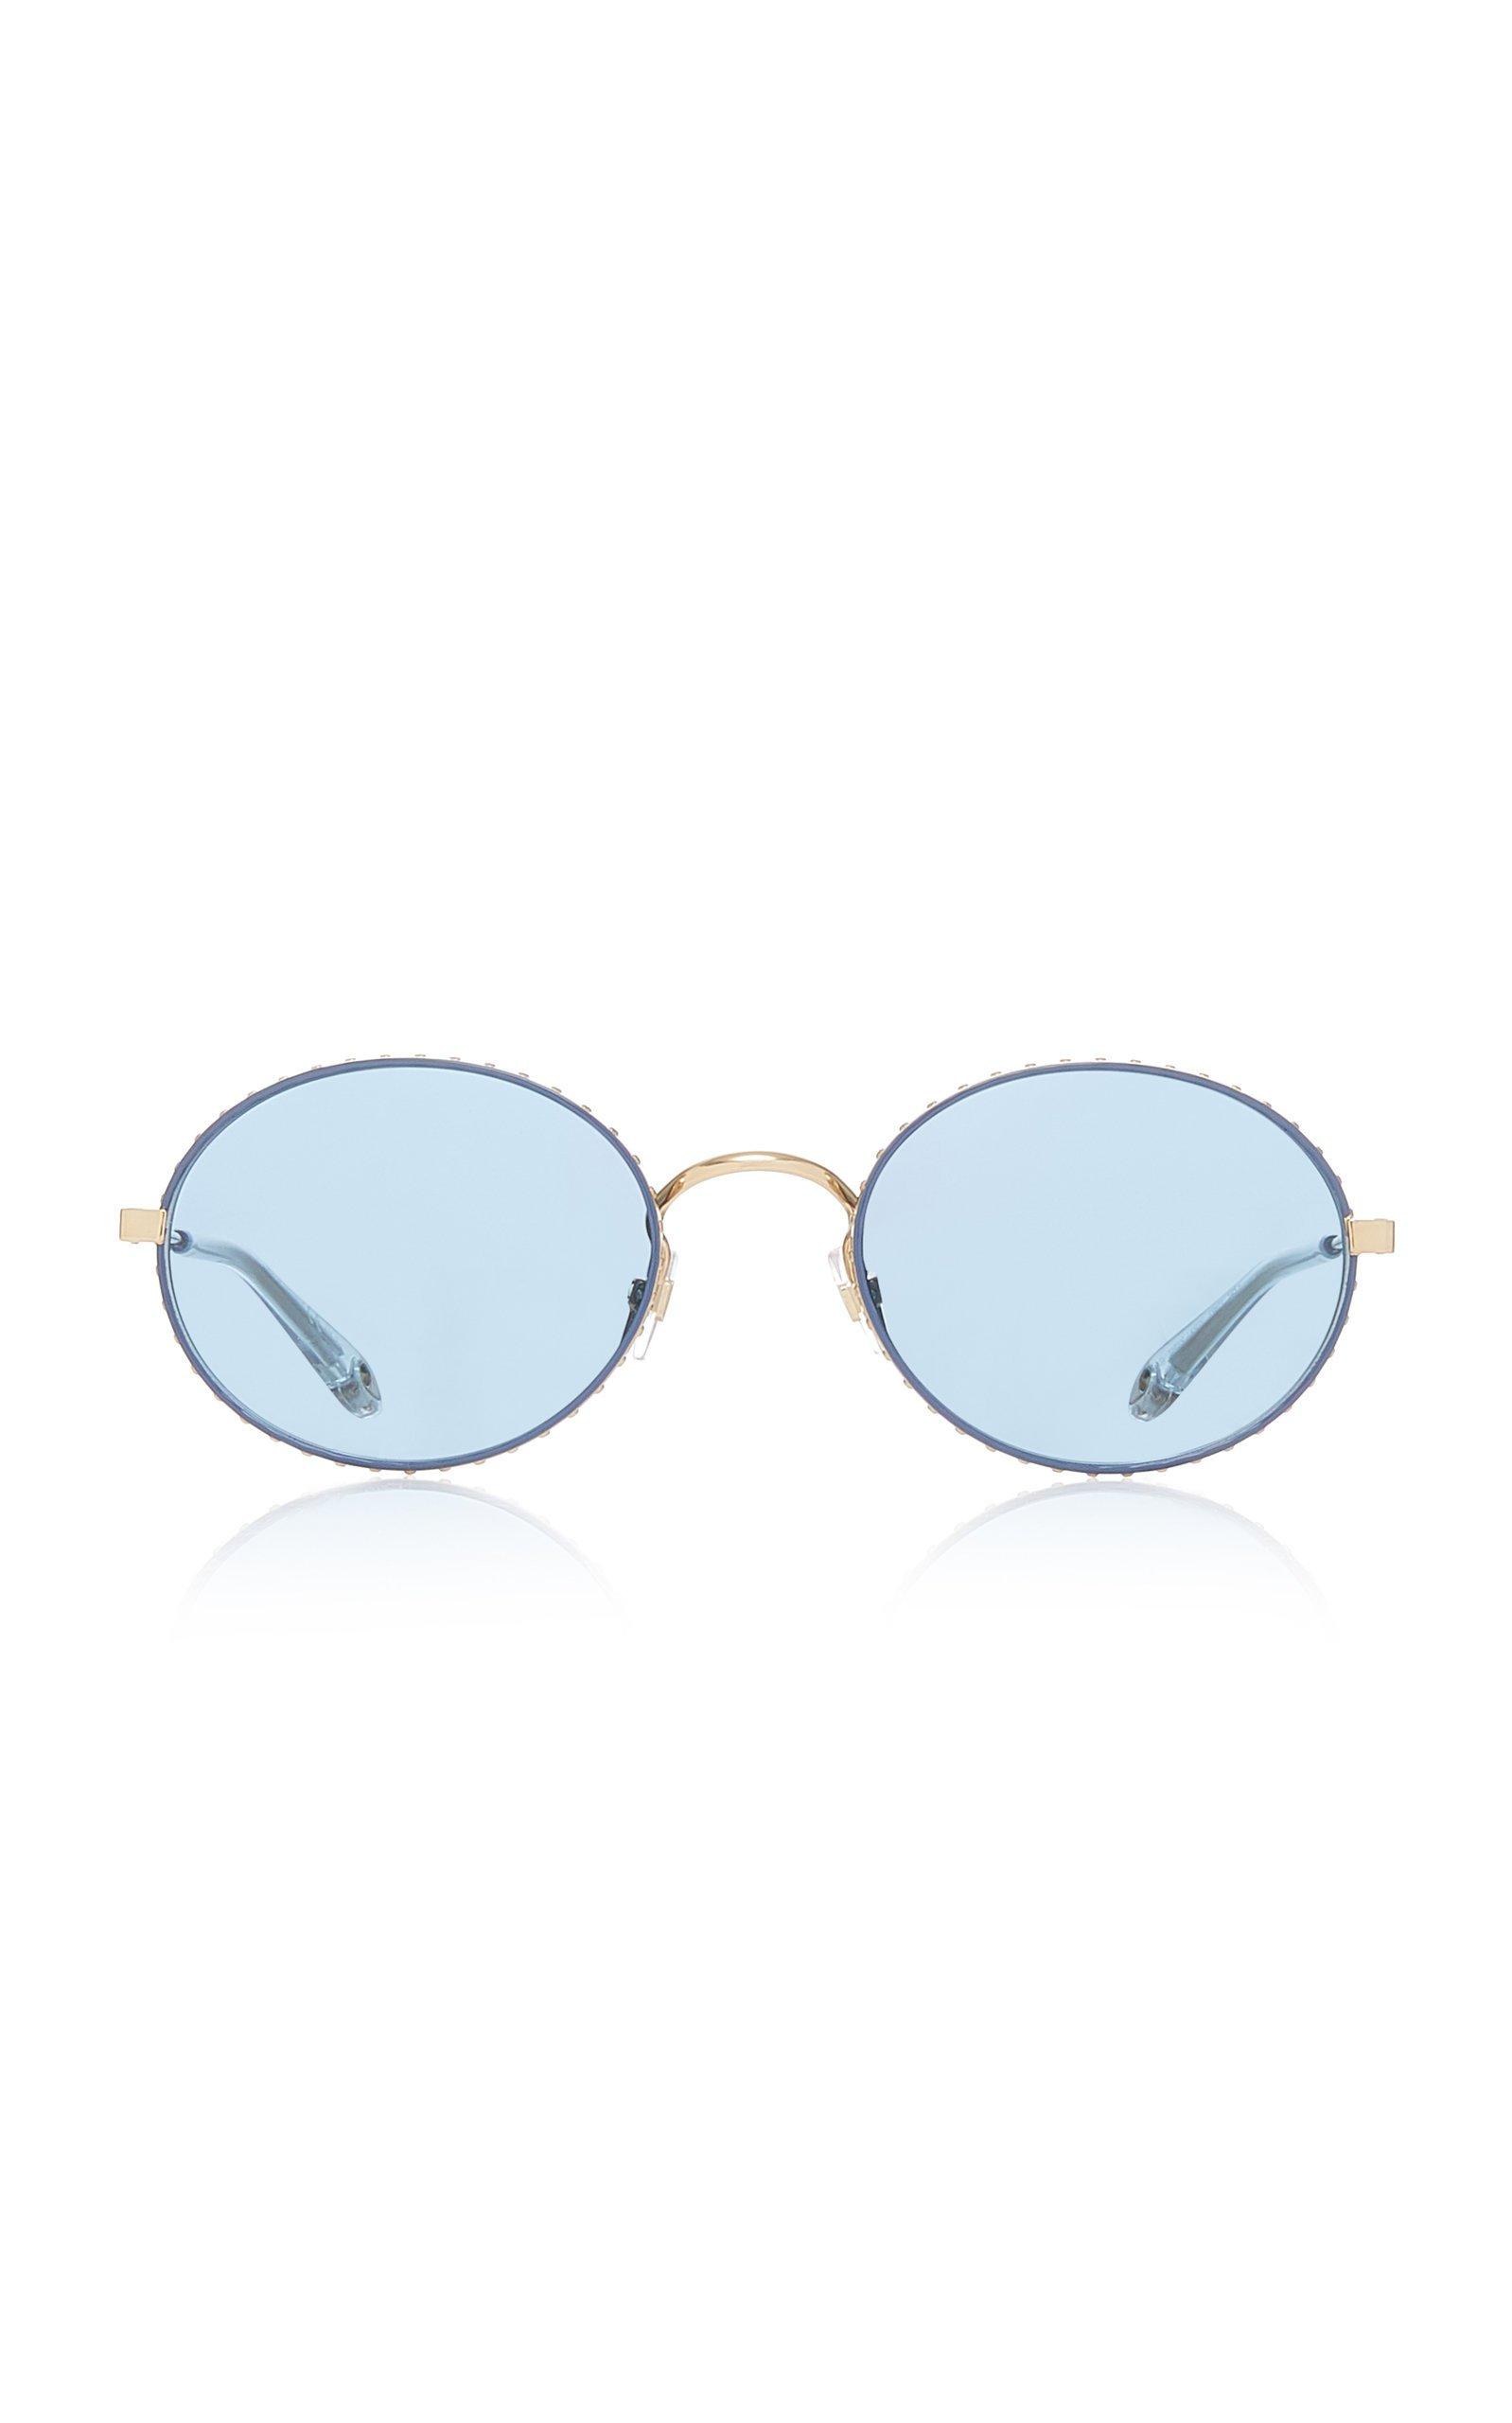 Givenchy Sunglasses Oval Sunglasses